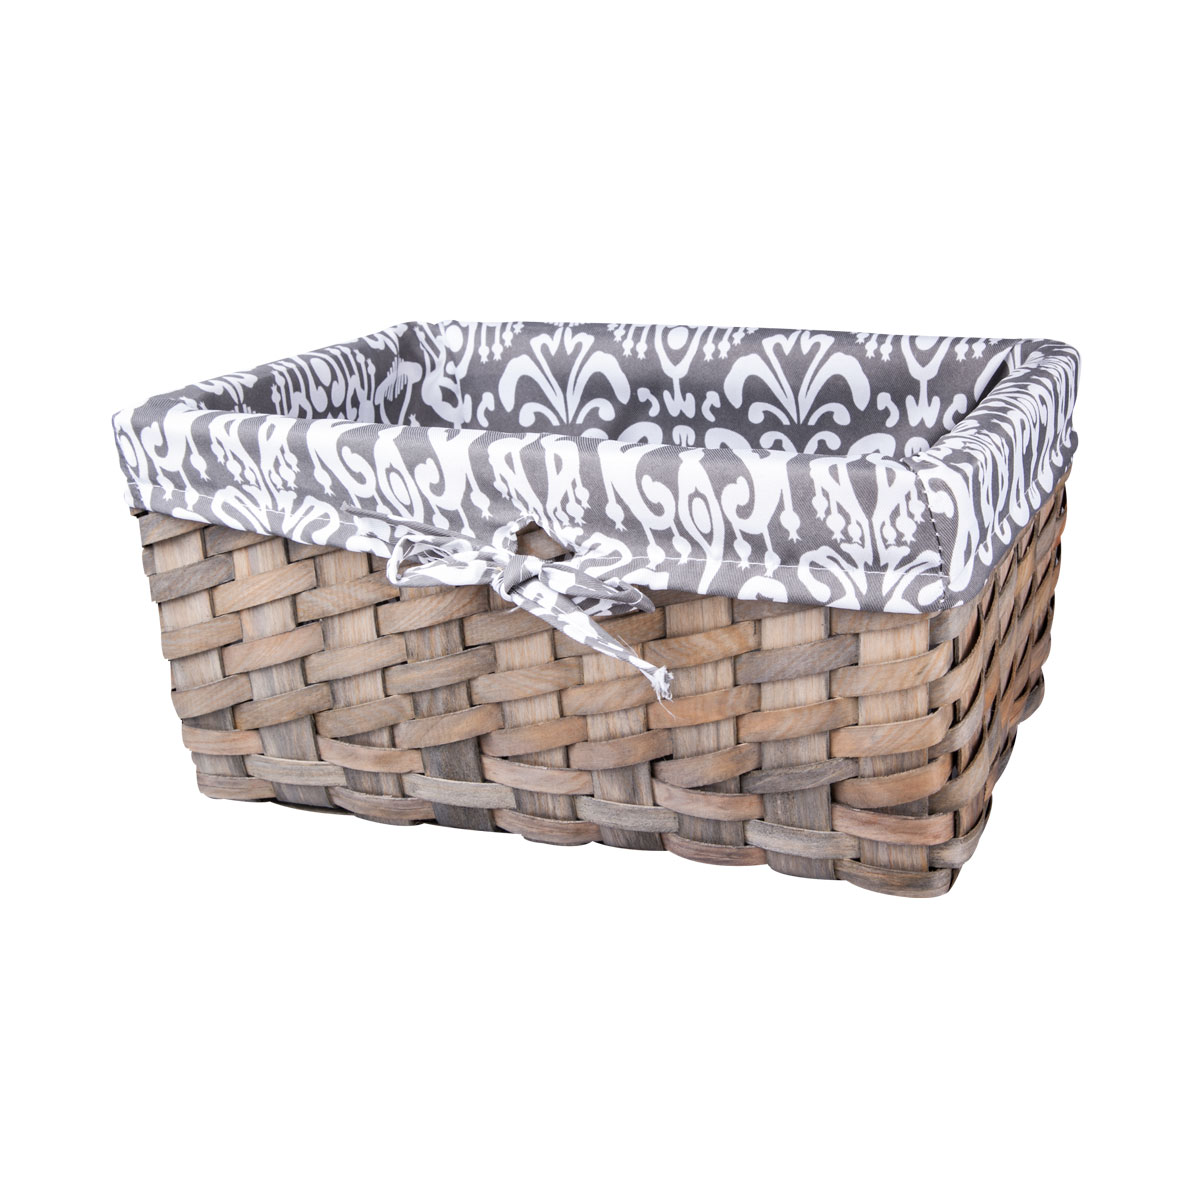 Корзина плетеная Miolla, 32 х 21 х 15 см бокс для хранения вещей kiss the plastic industry